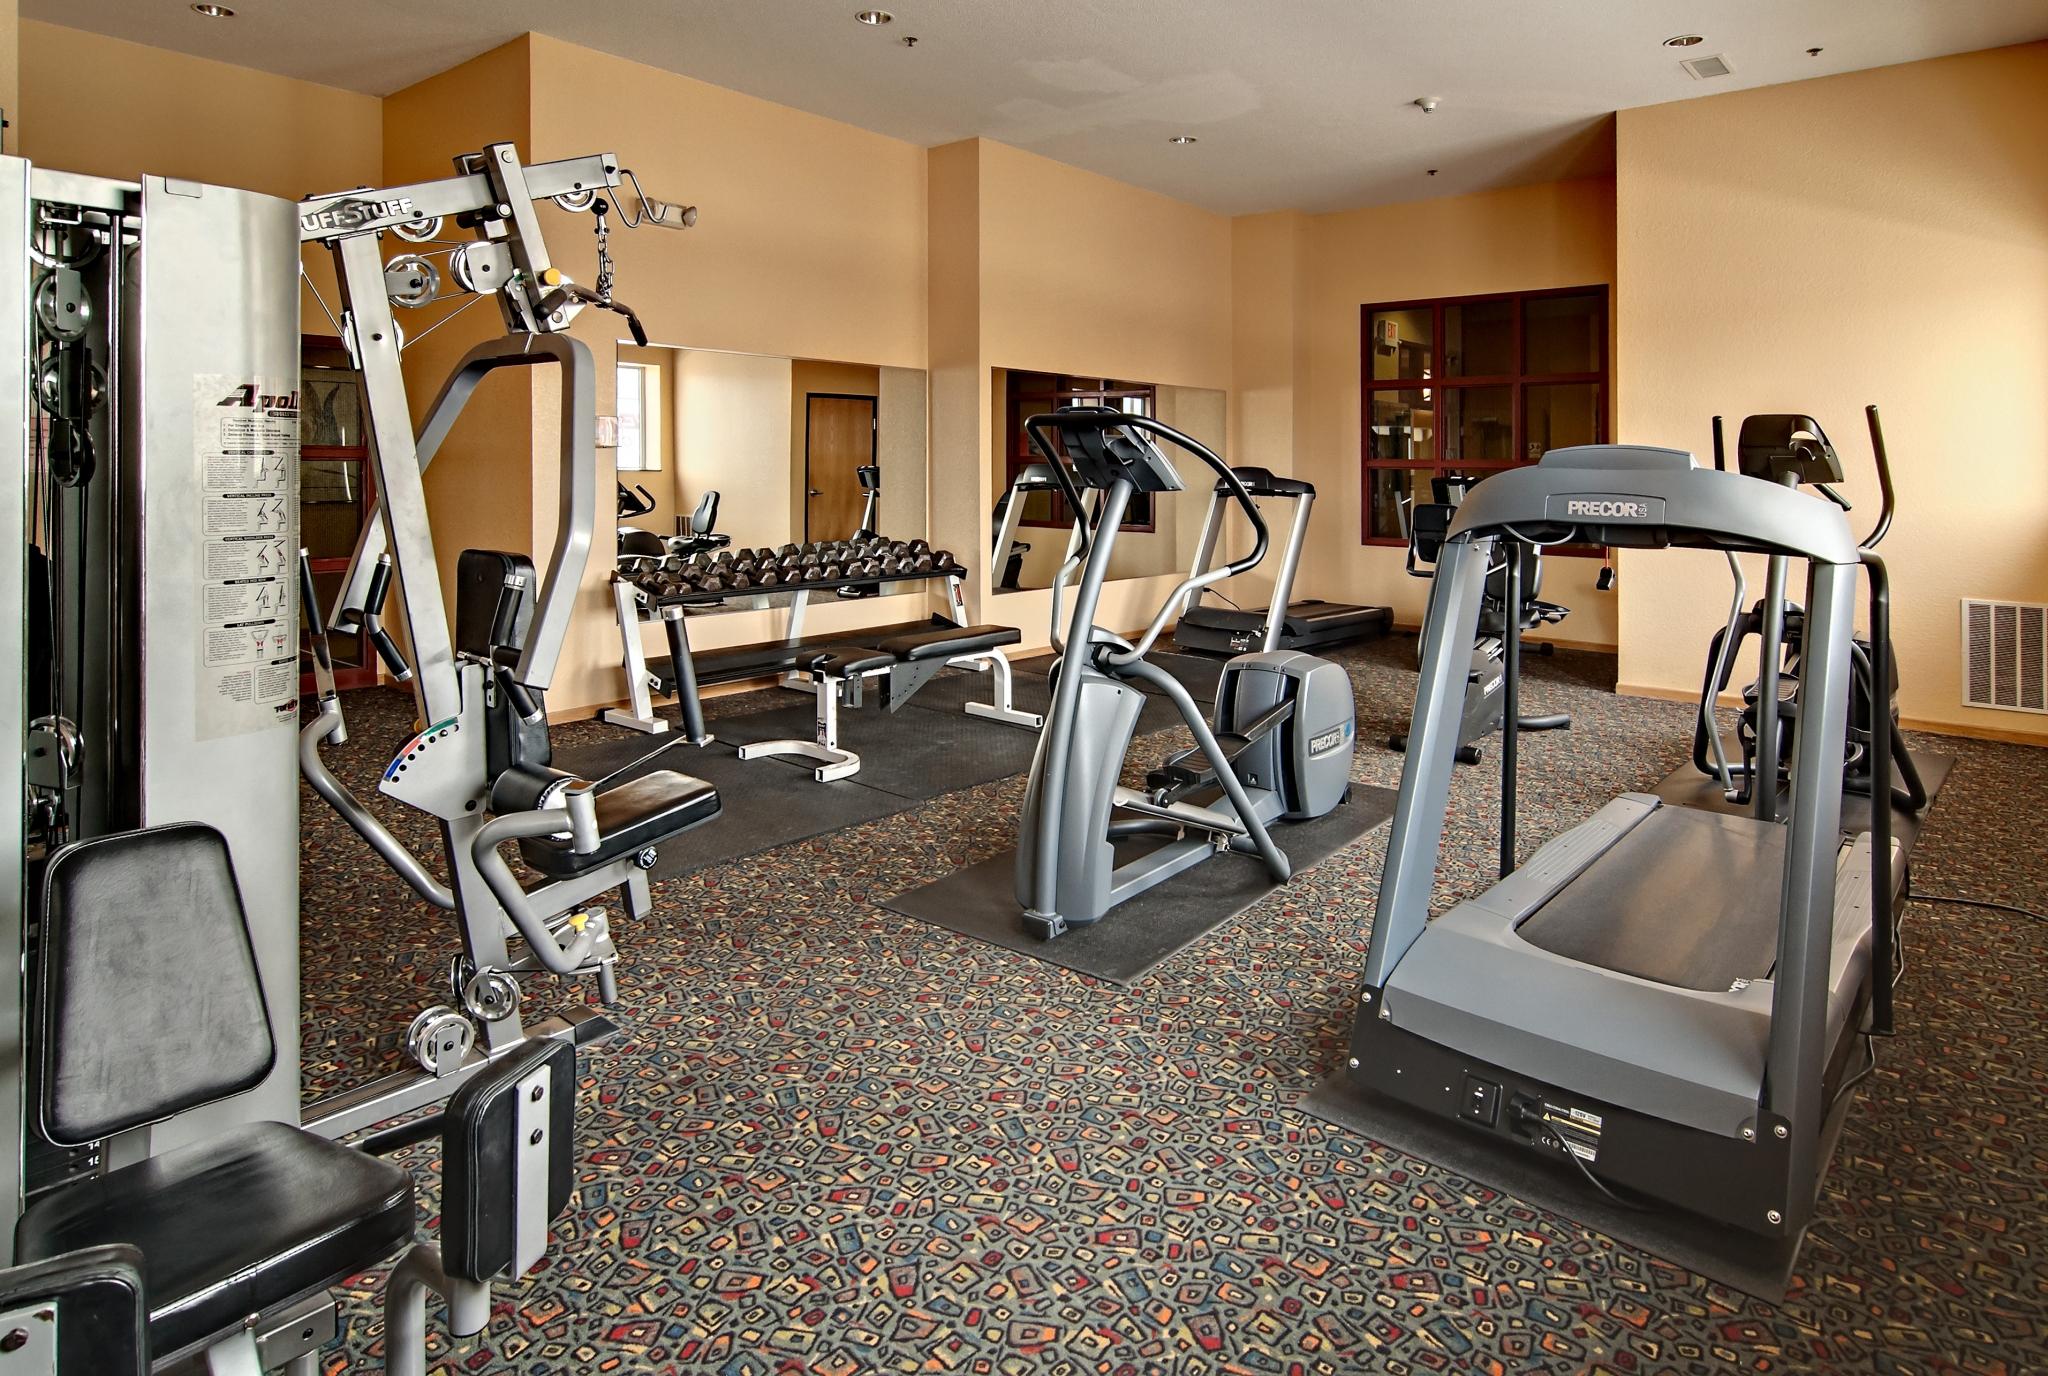 Image of Set Hours Fitness Center for University Village West